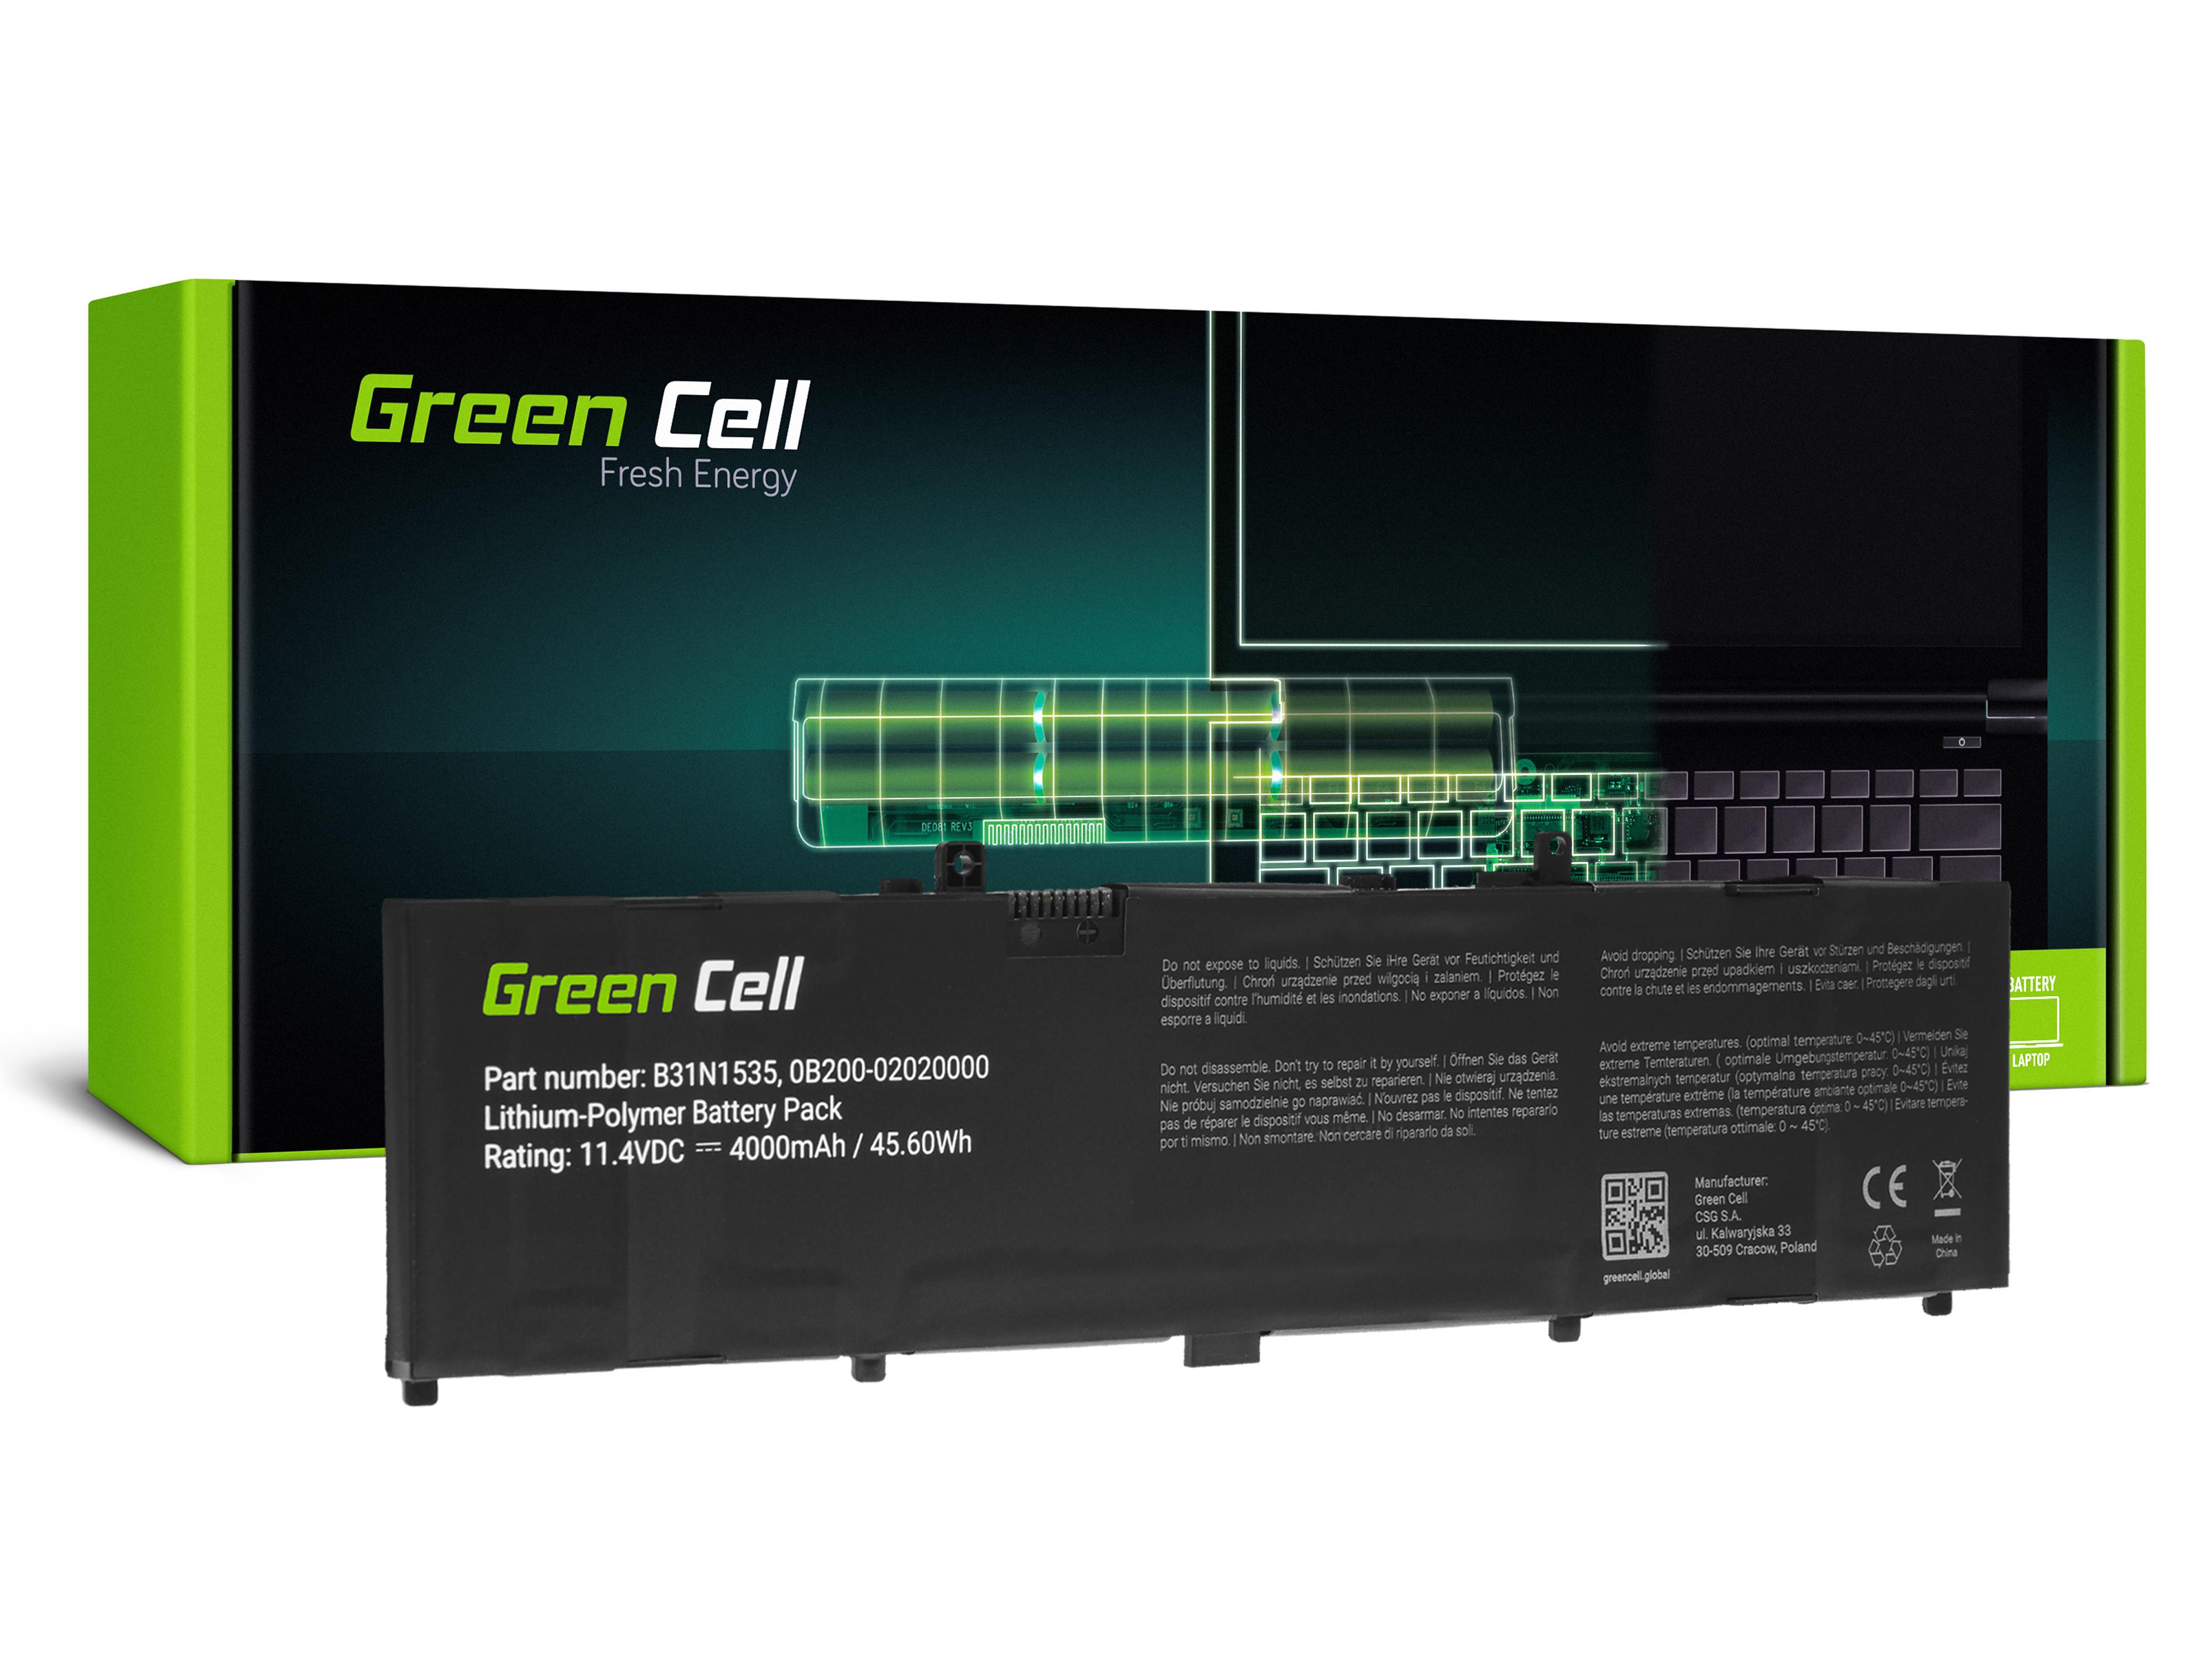 Green Cell AS158 Baterie Asus B31N1535, Asus Asus ZenBook UX310 UX310U UX310UA UX310UQ UX410 UX410U UX410UA UX410UF UX410UQ UX3410 UX3410U 4000mAh Li-Pol – neoriginální